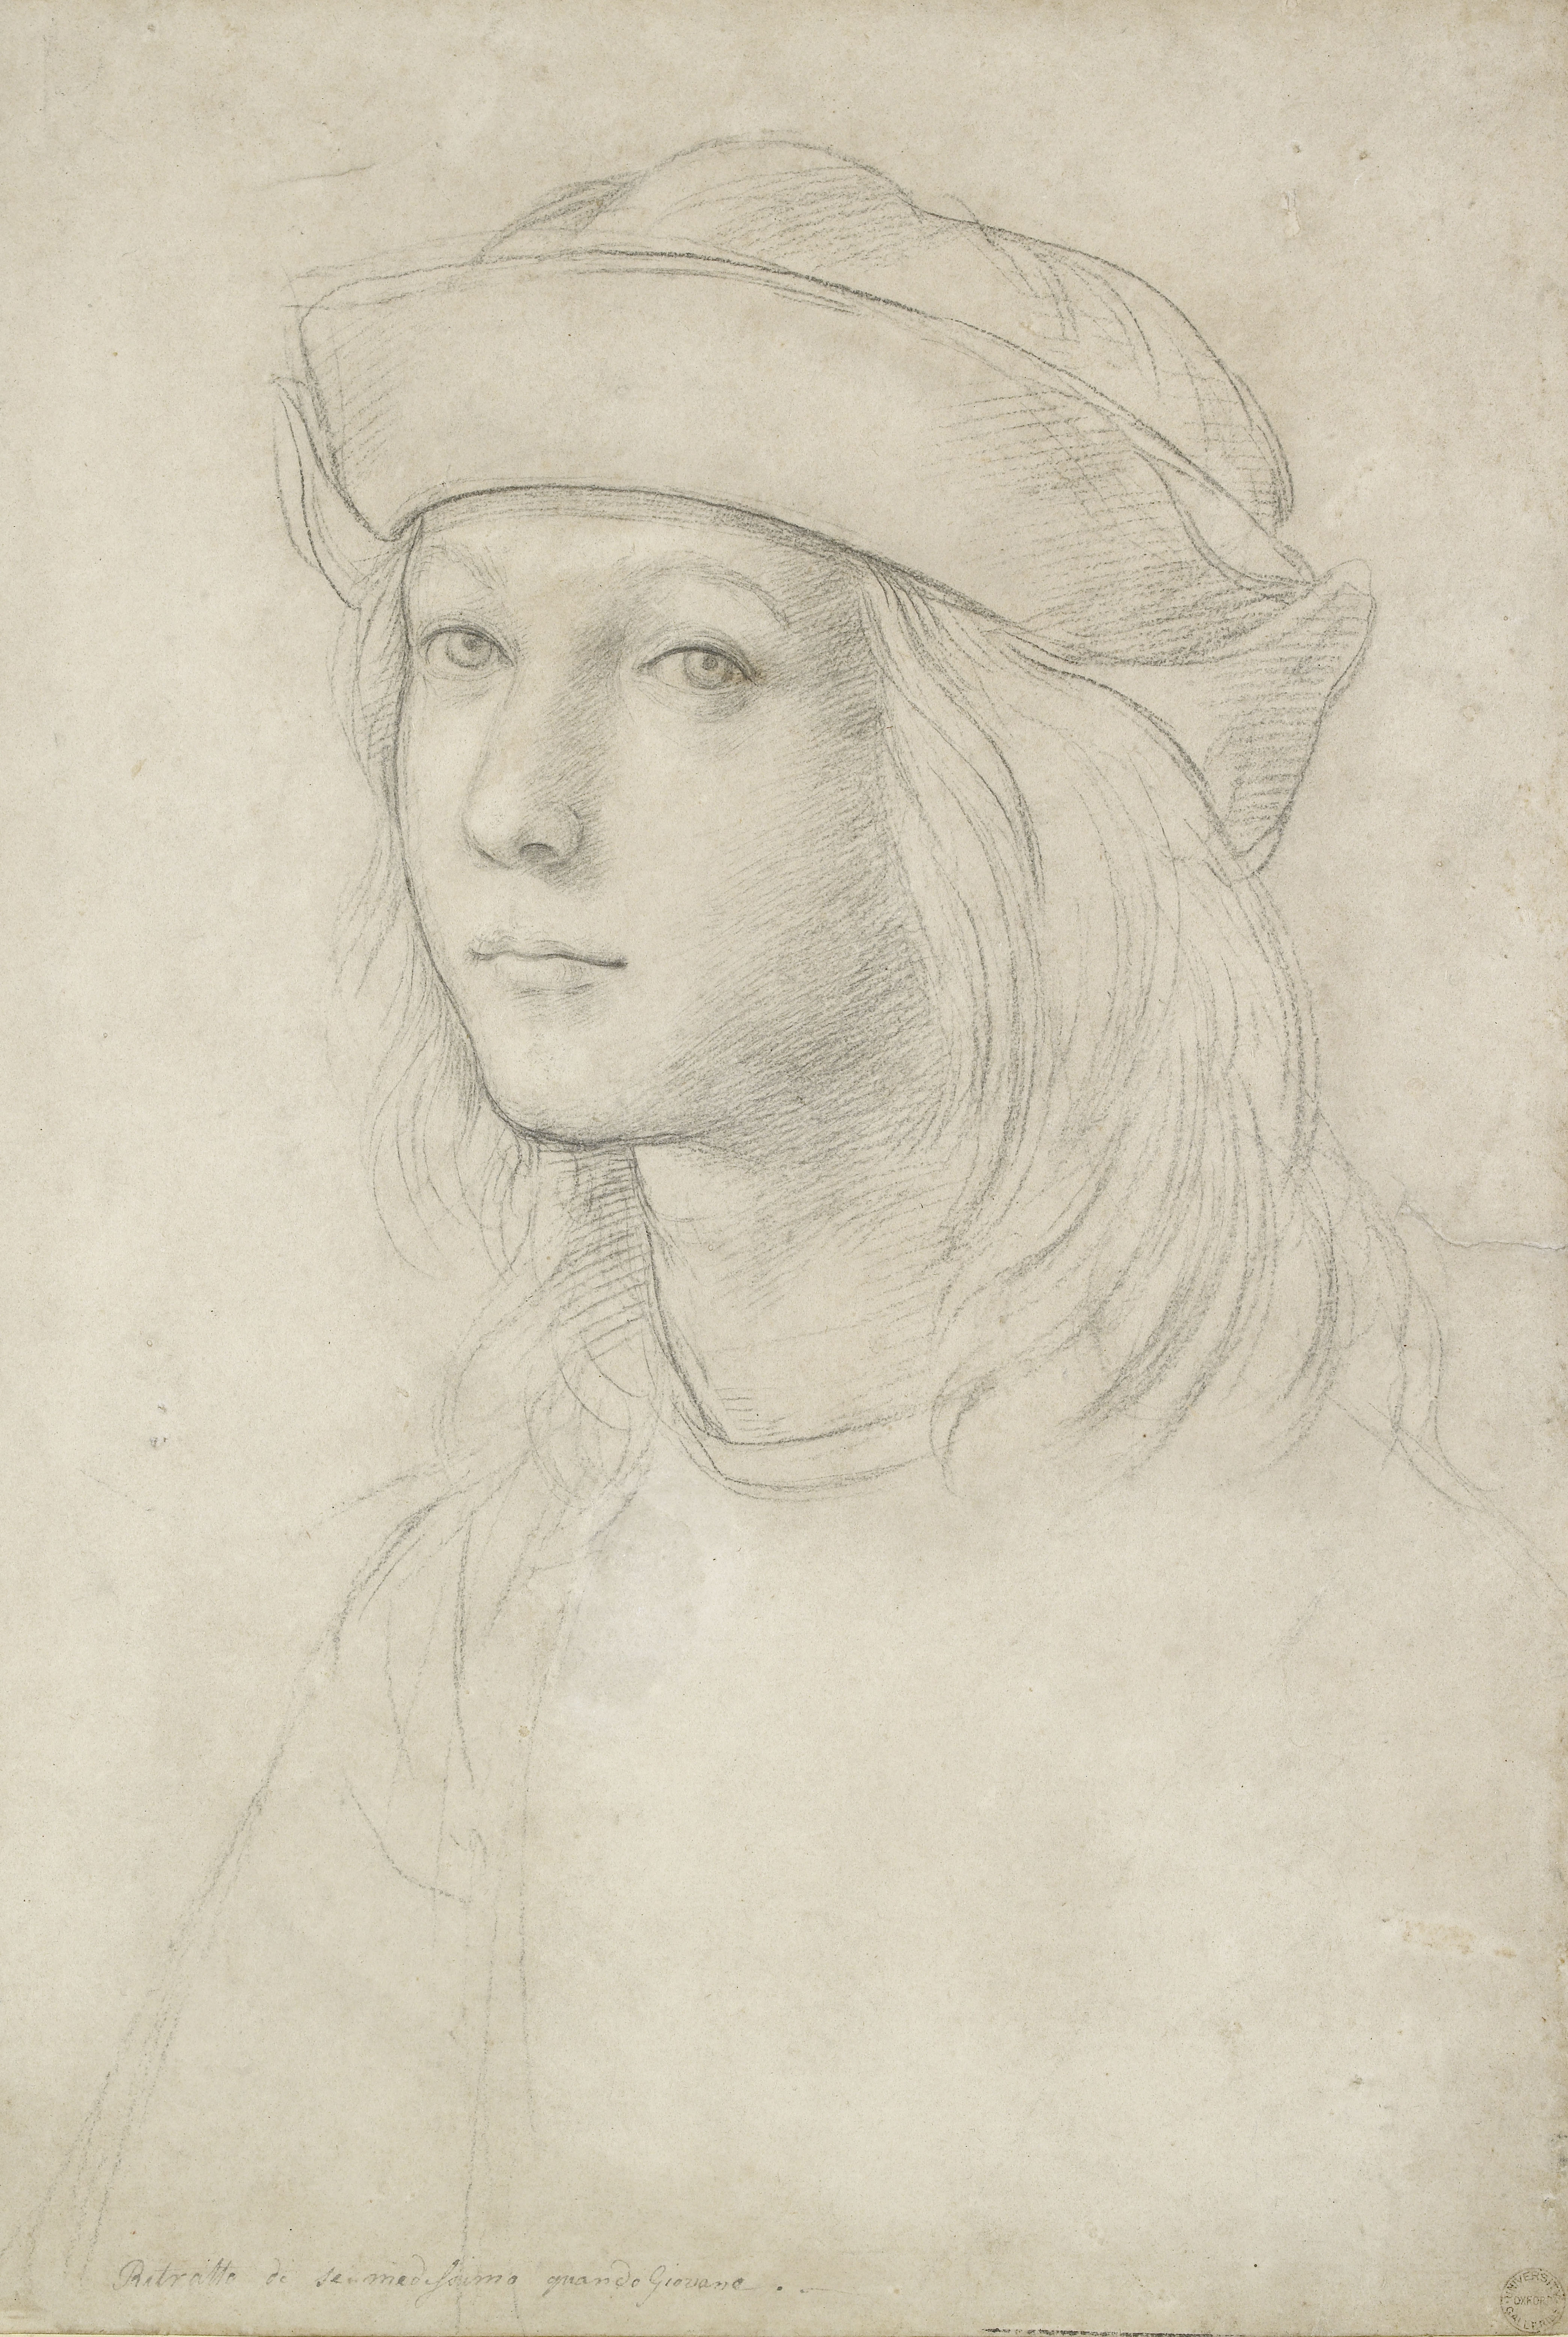 1. Youth (c) Ashmolean Museum, University of Oxford